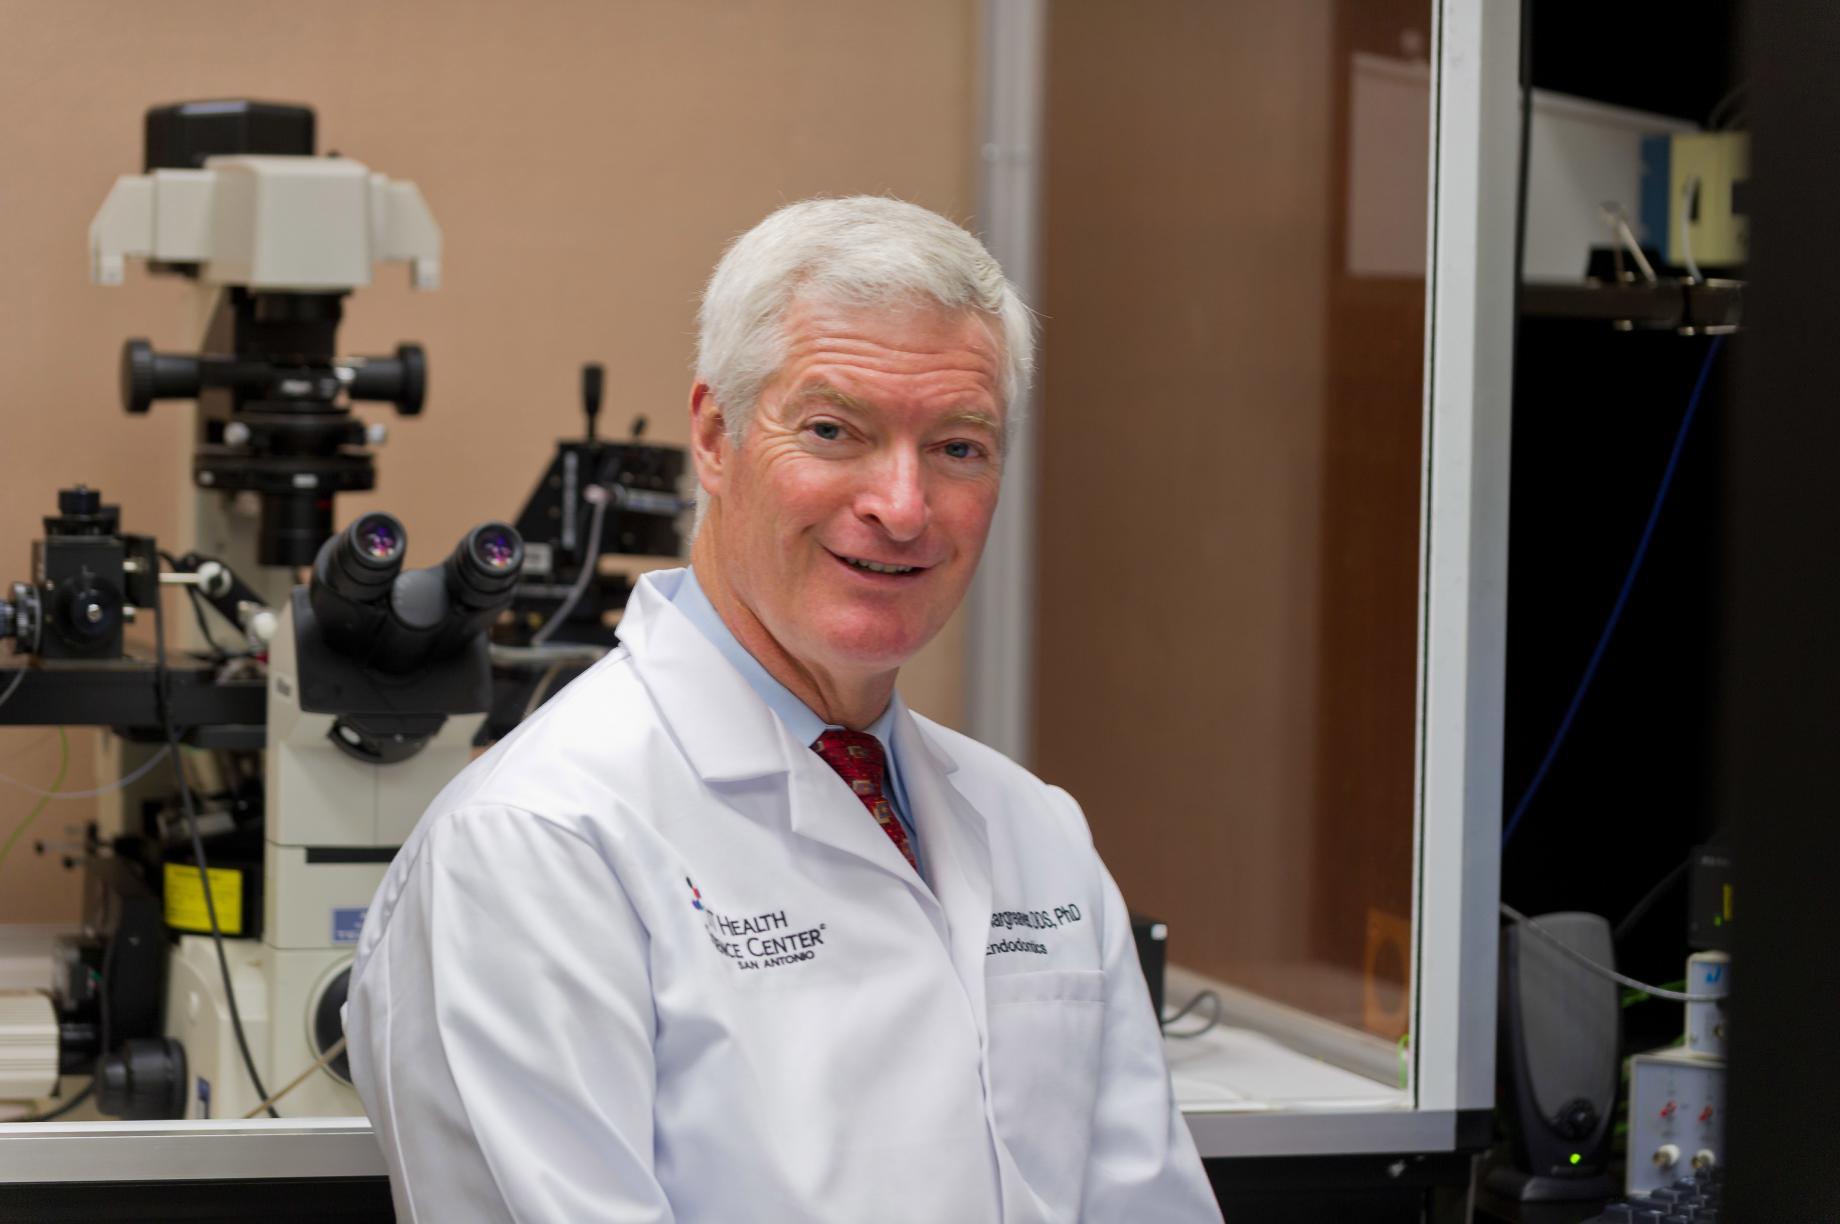 Ken Hargreaves, D.D.S., Ph.D.